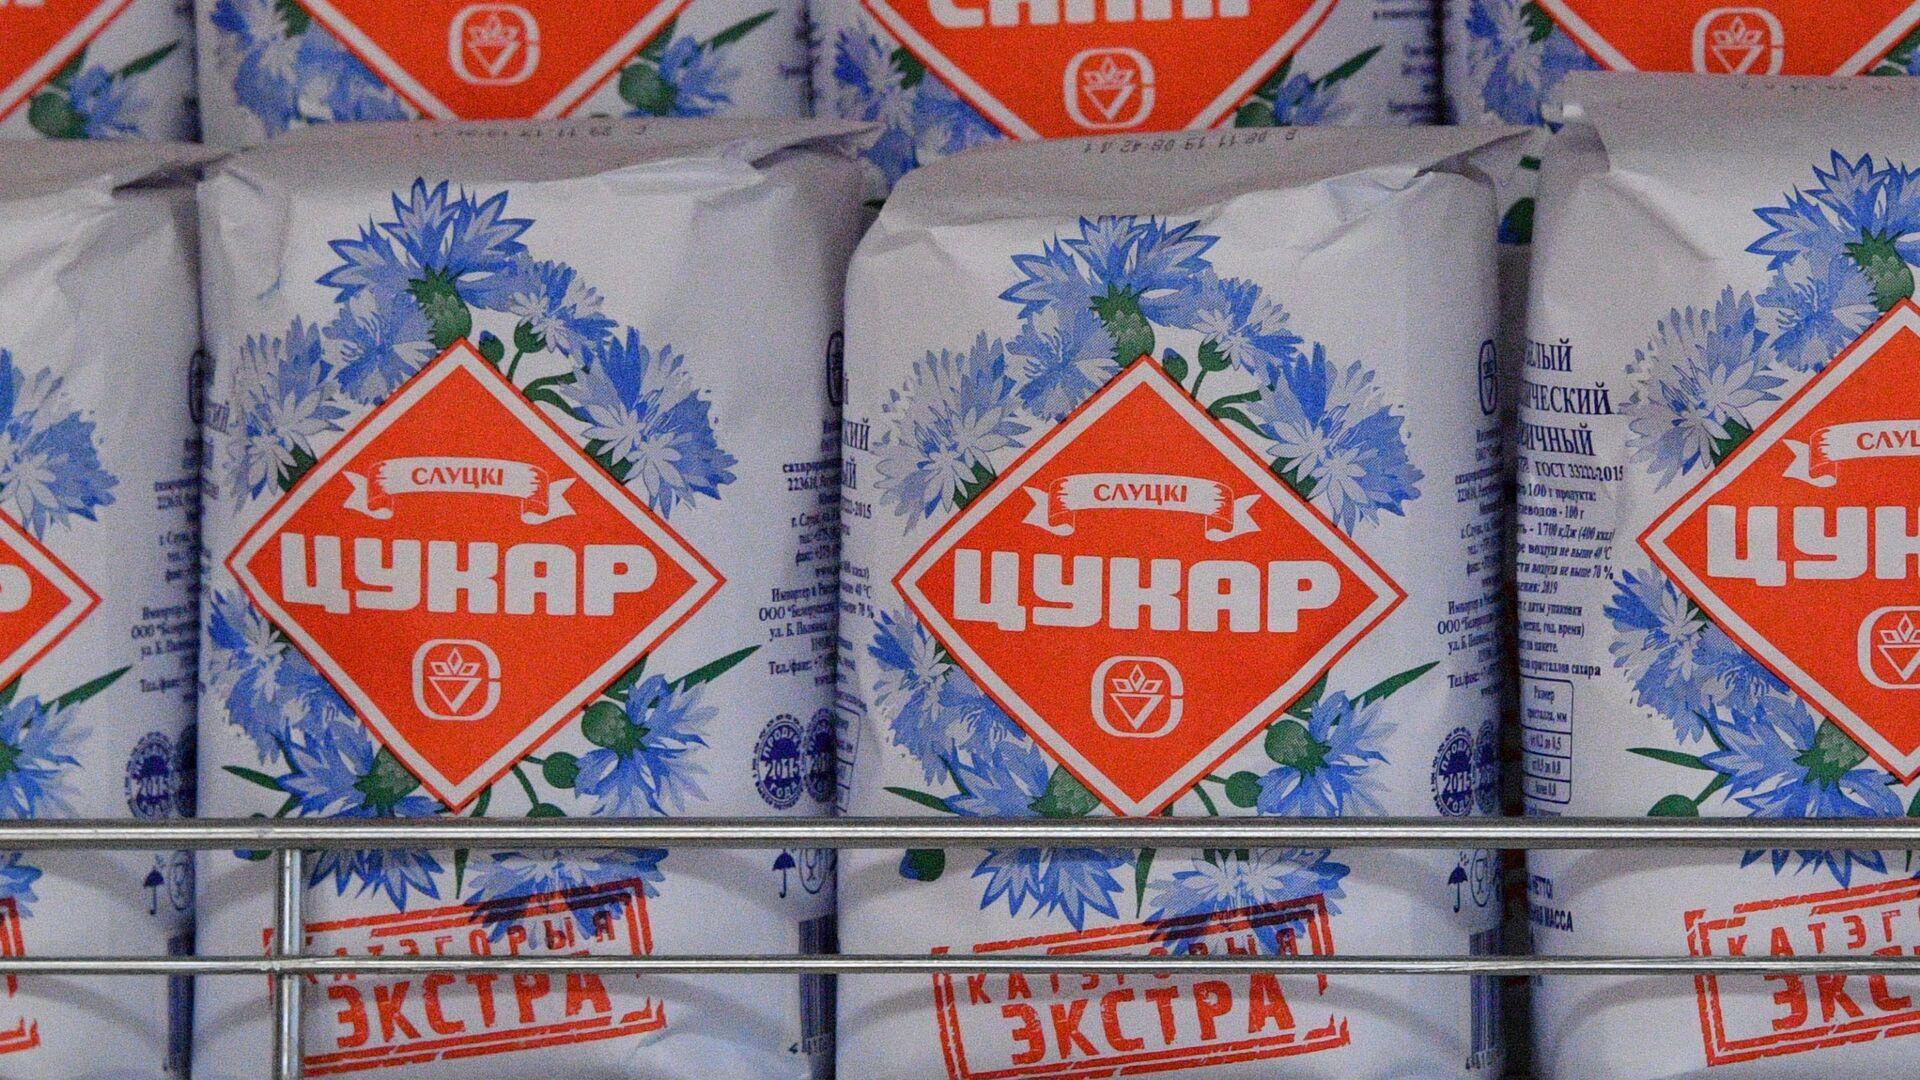 Слуцкий сахар - Sputnik Беларусь, 1920, 21.09.2021